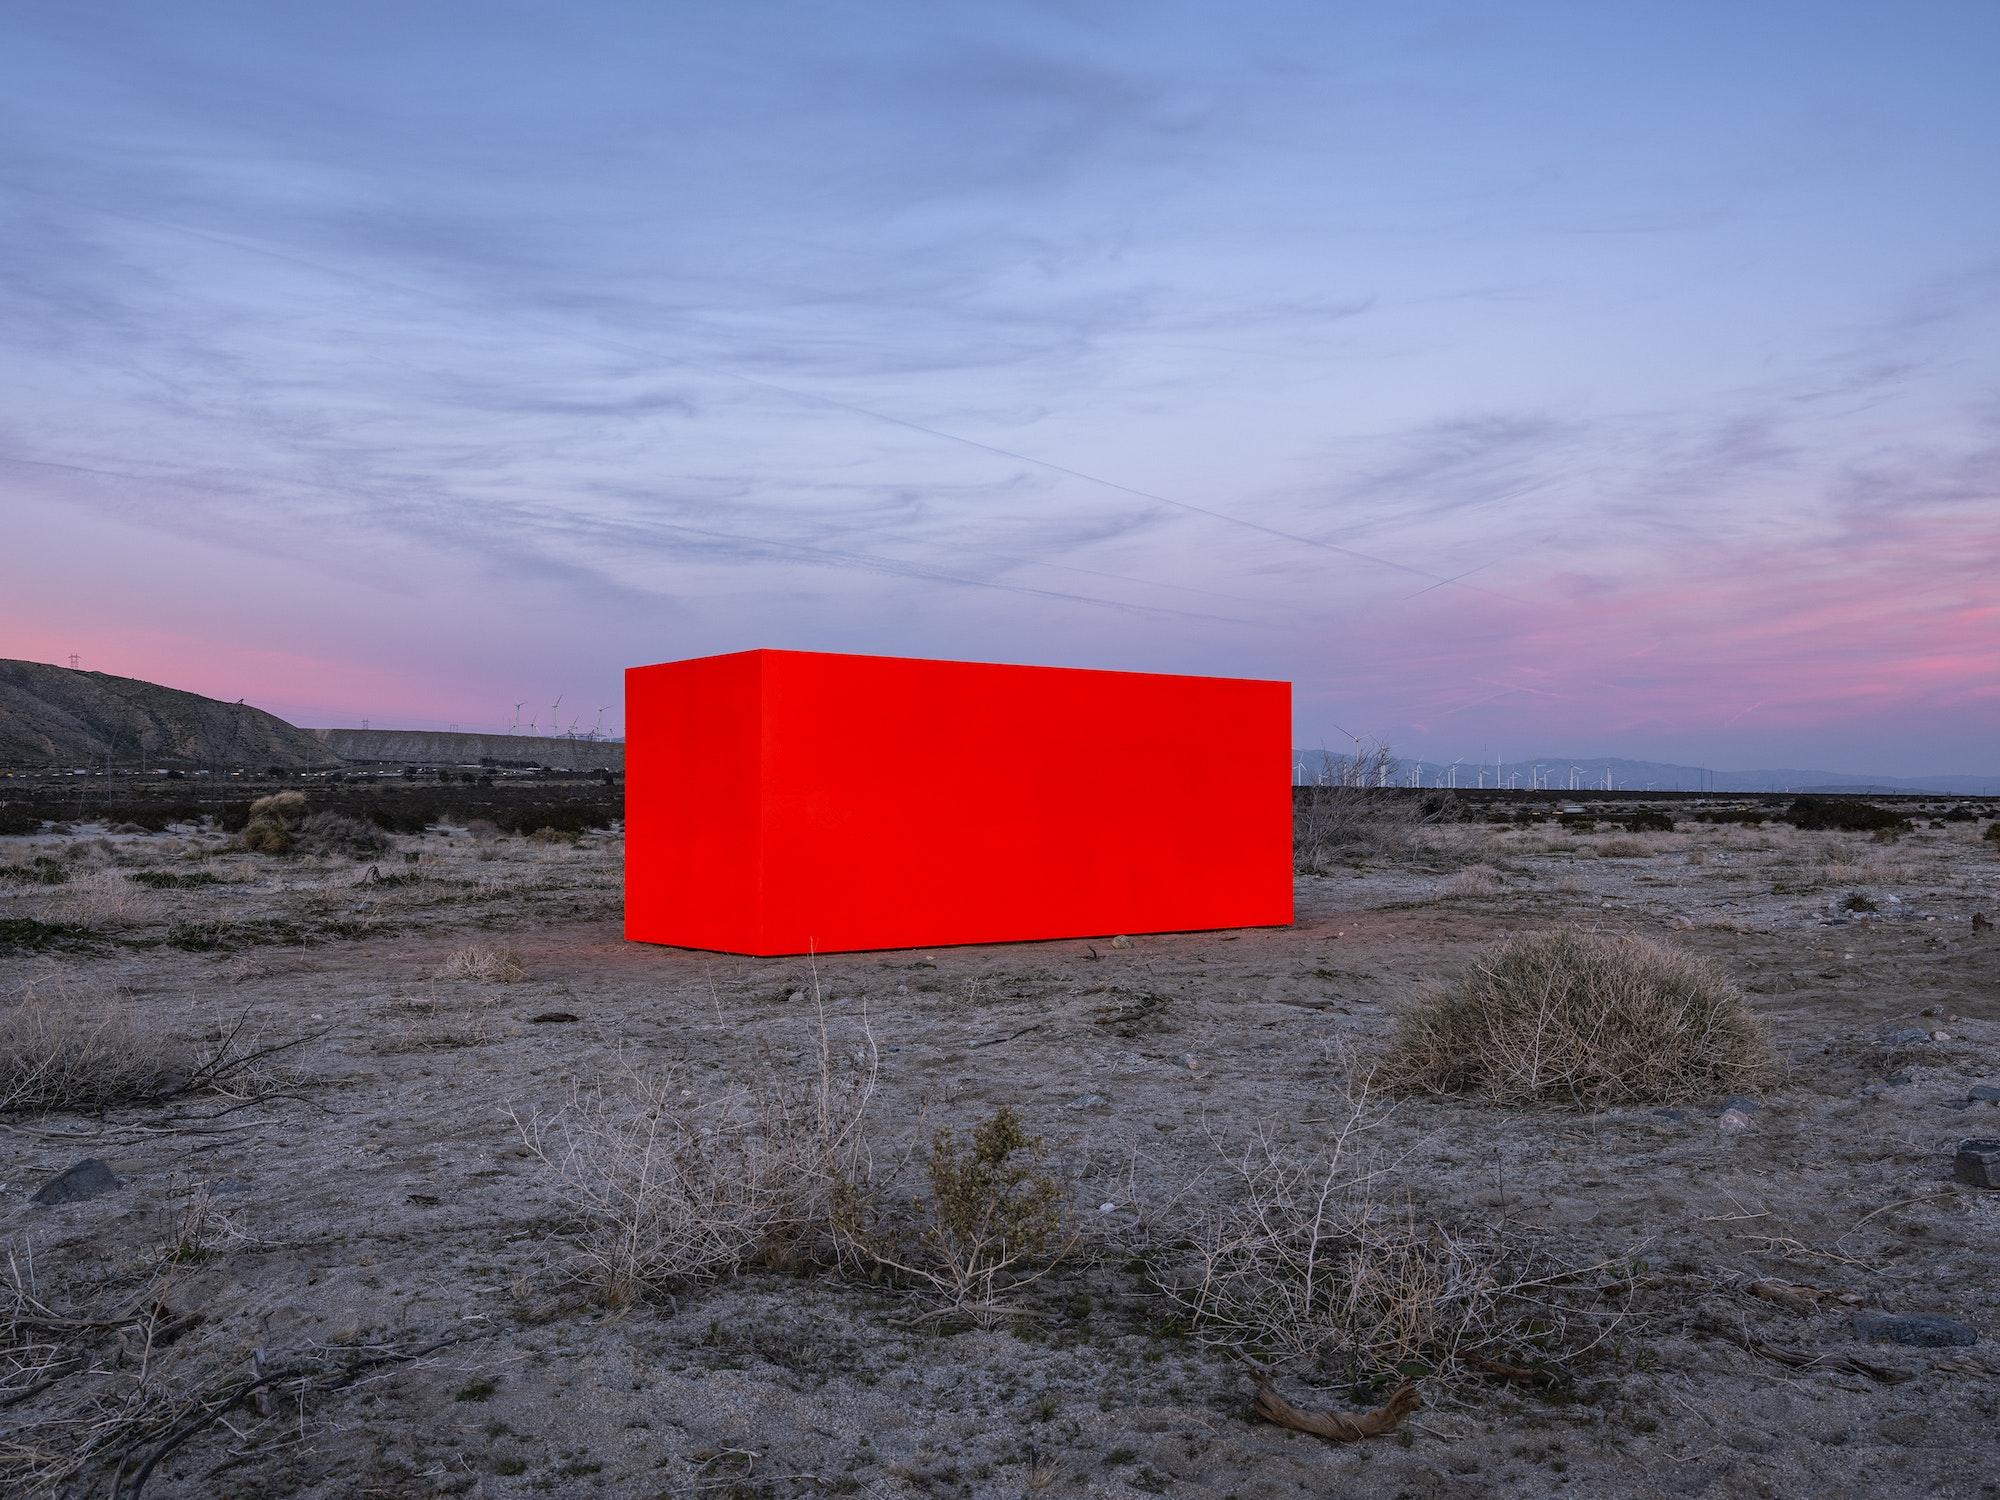 The contemporary site-specific art exhibition, Desert X, returns to Coachella Valley